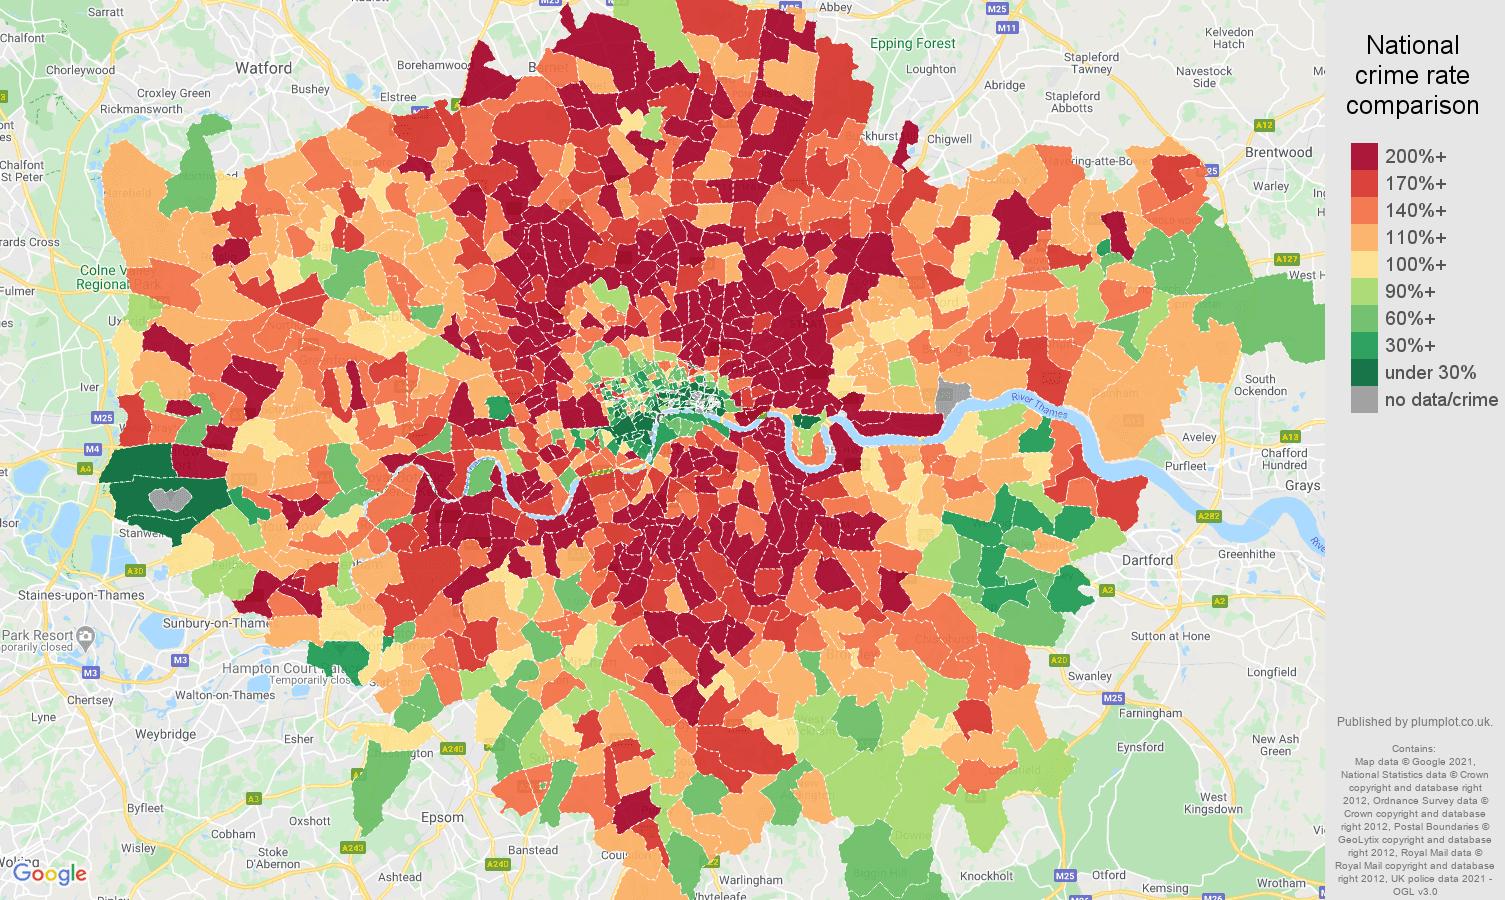 London burglary crime rate comparison map